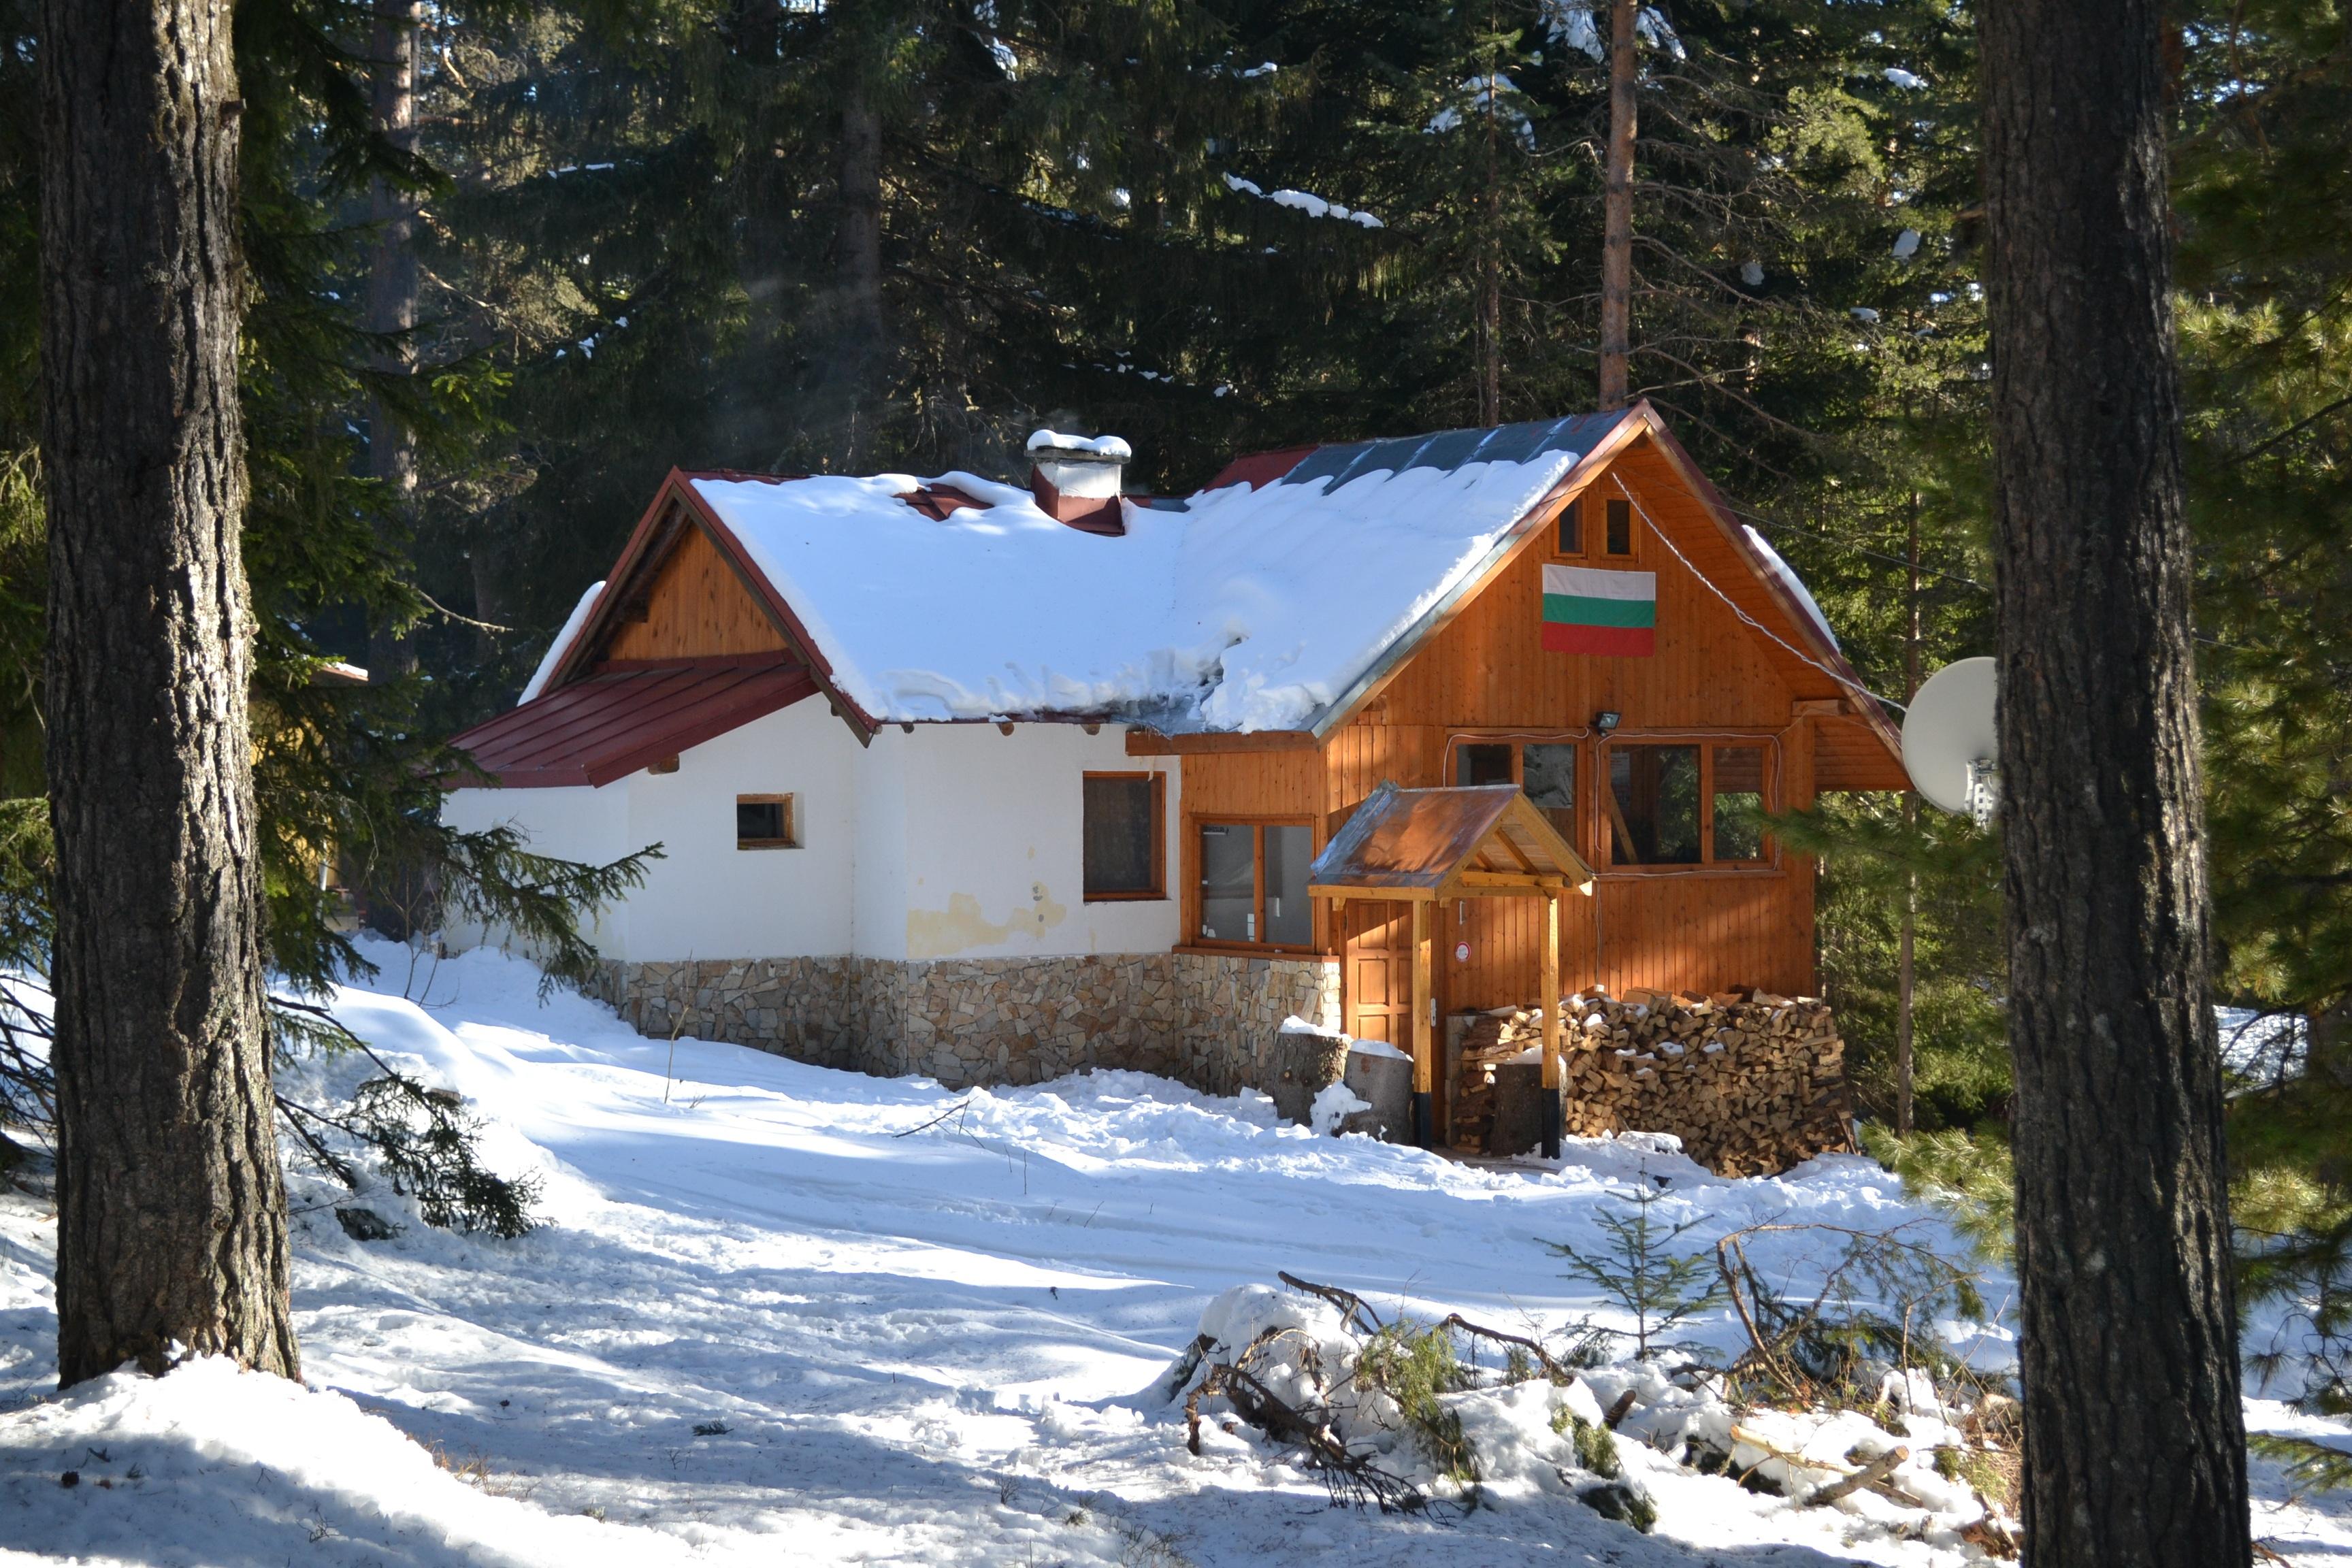 Fotoğraf Peyzaj çöl Kar Kış Ev Dağ Sırası Seyahat Köy Buz